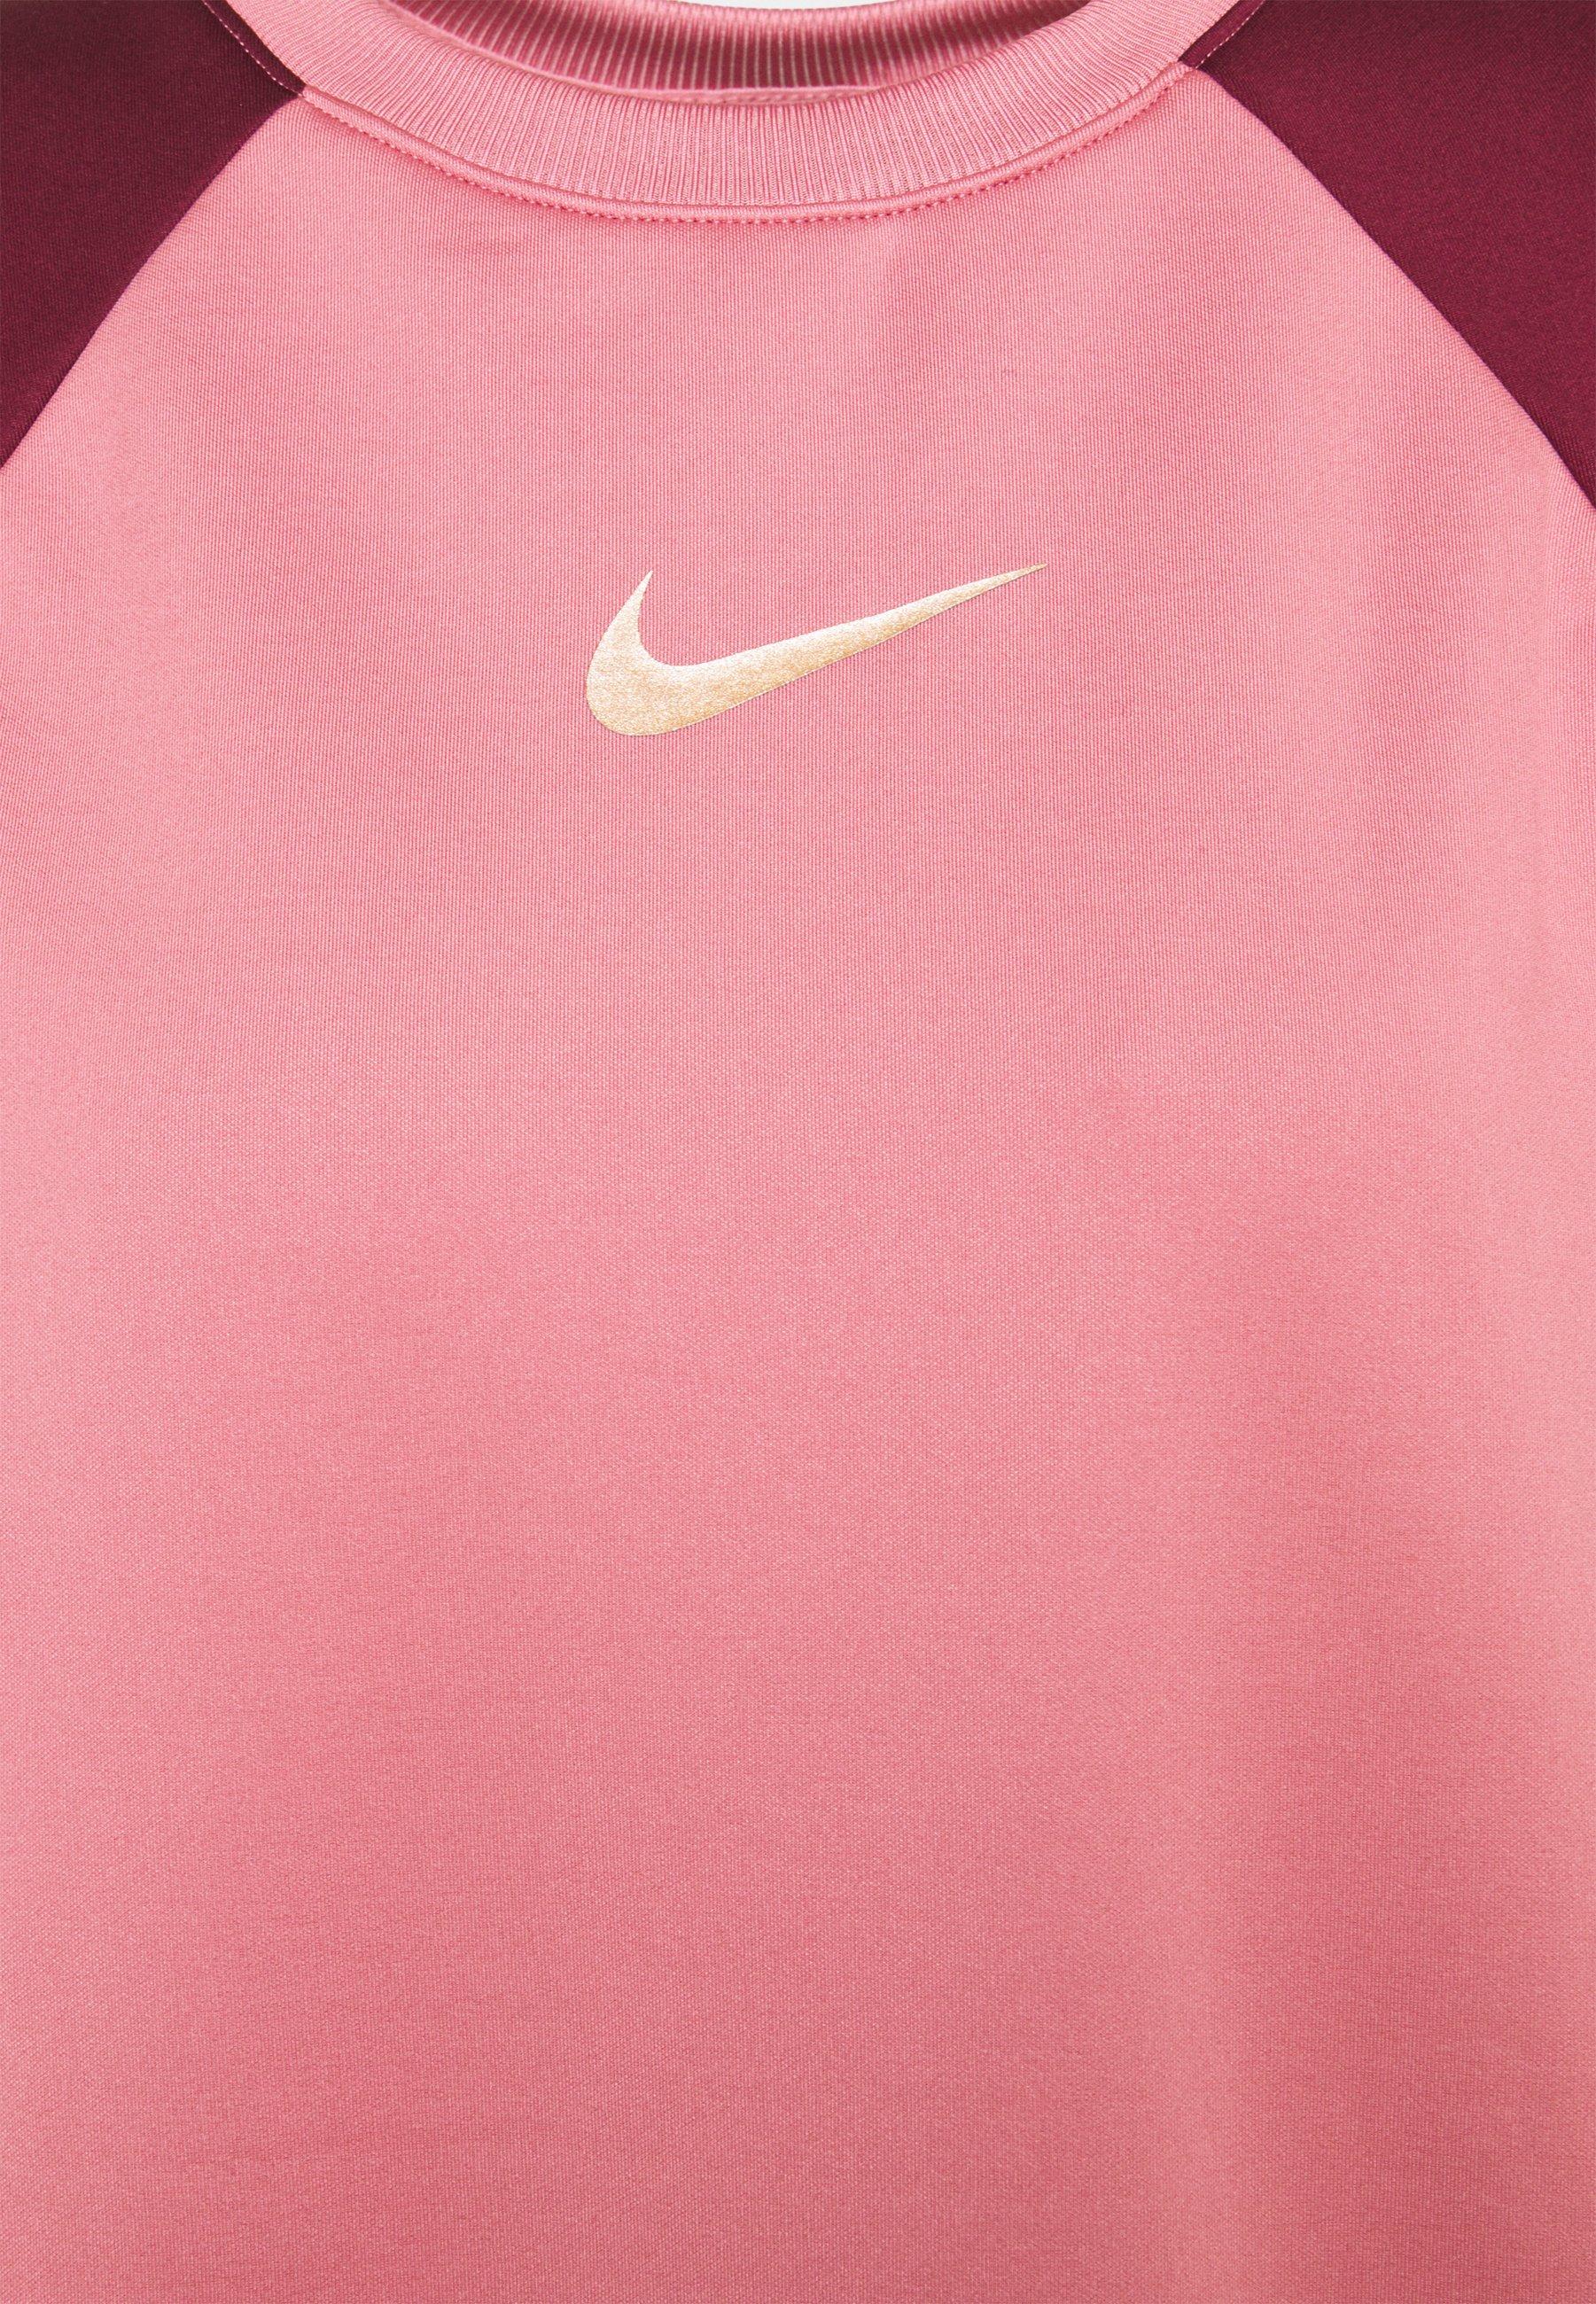 Nike Performance Fleece jumper - desert berry/dark beetroot/red bronze hSGlA